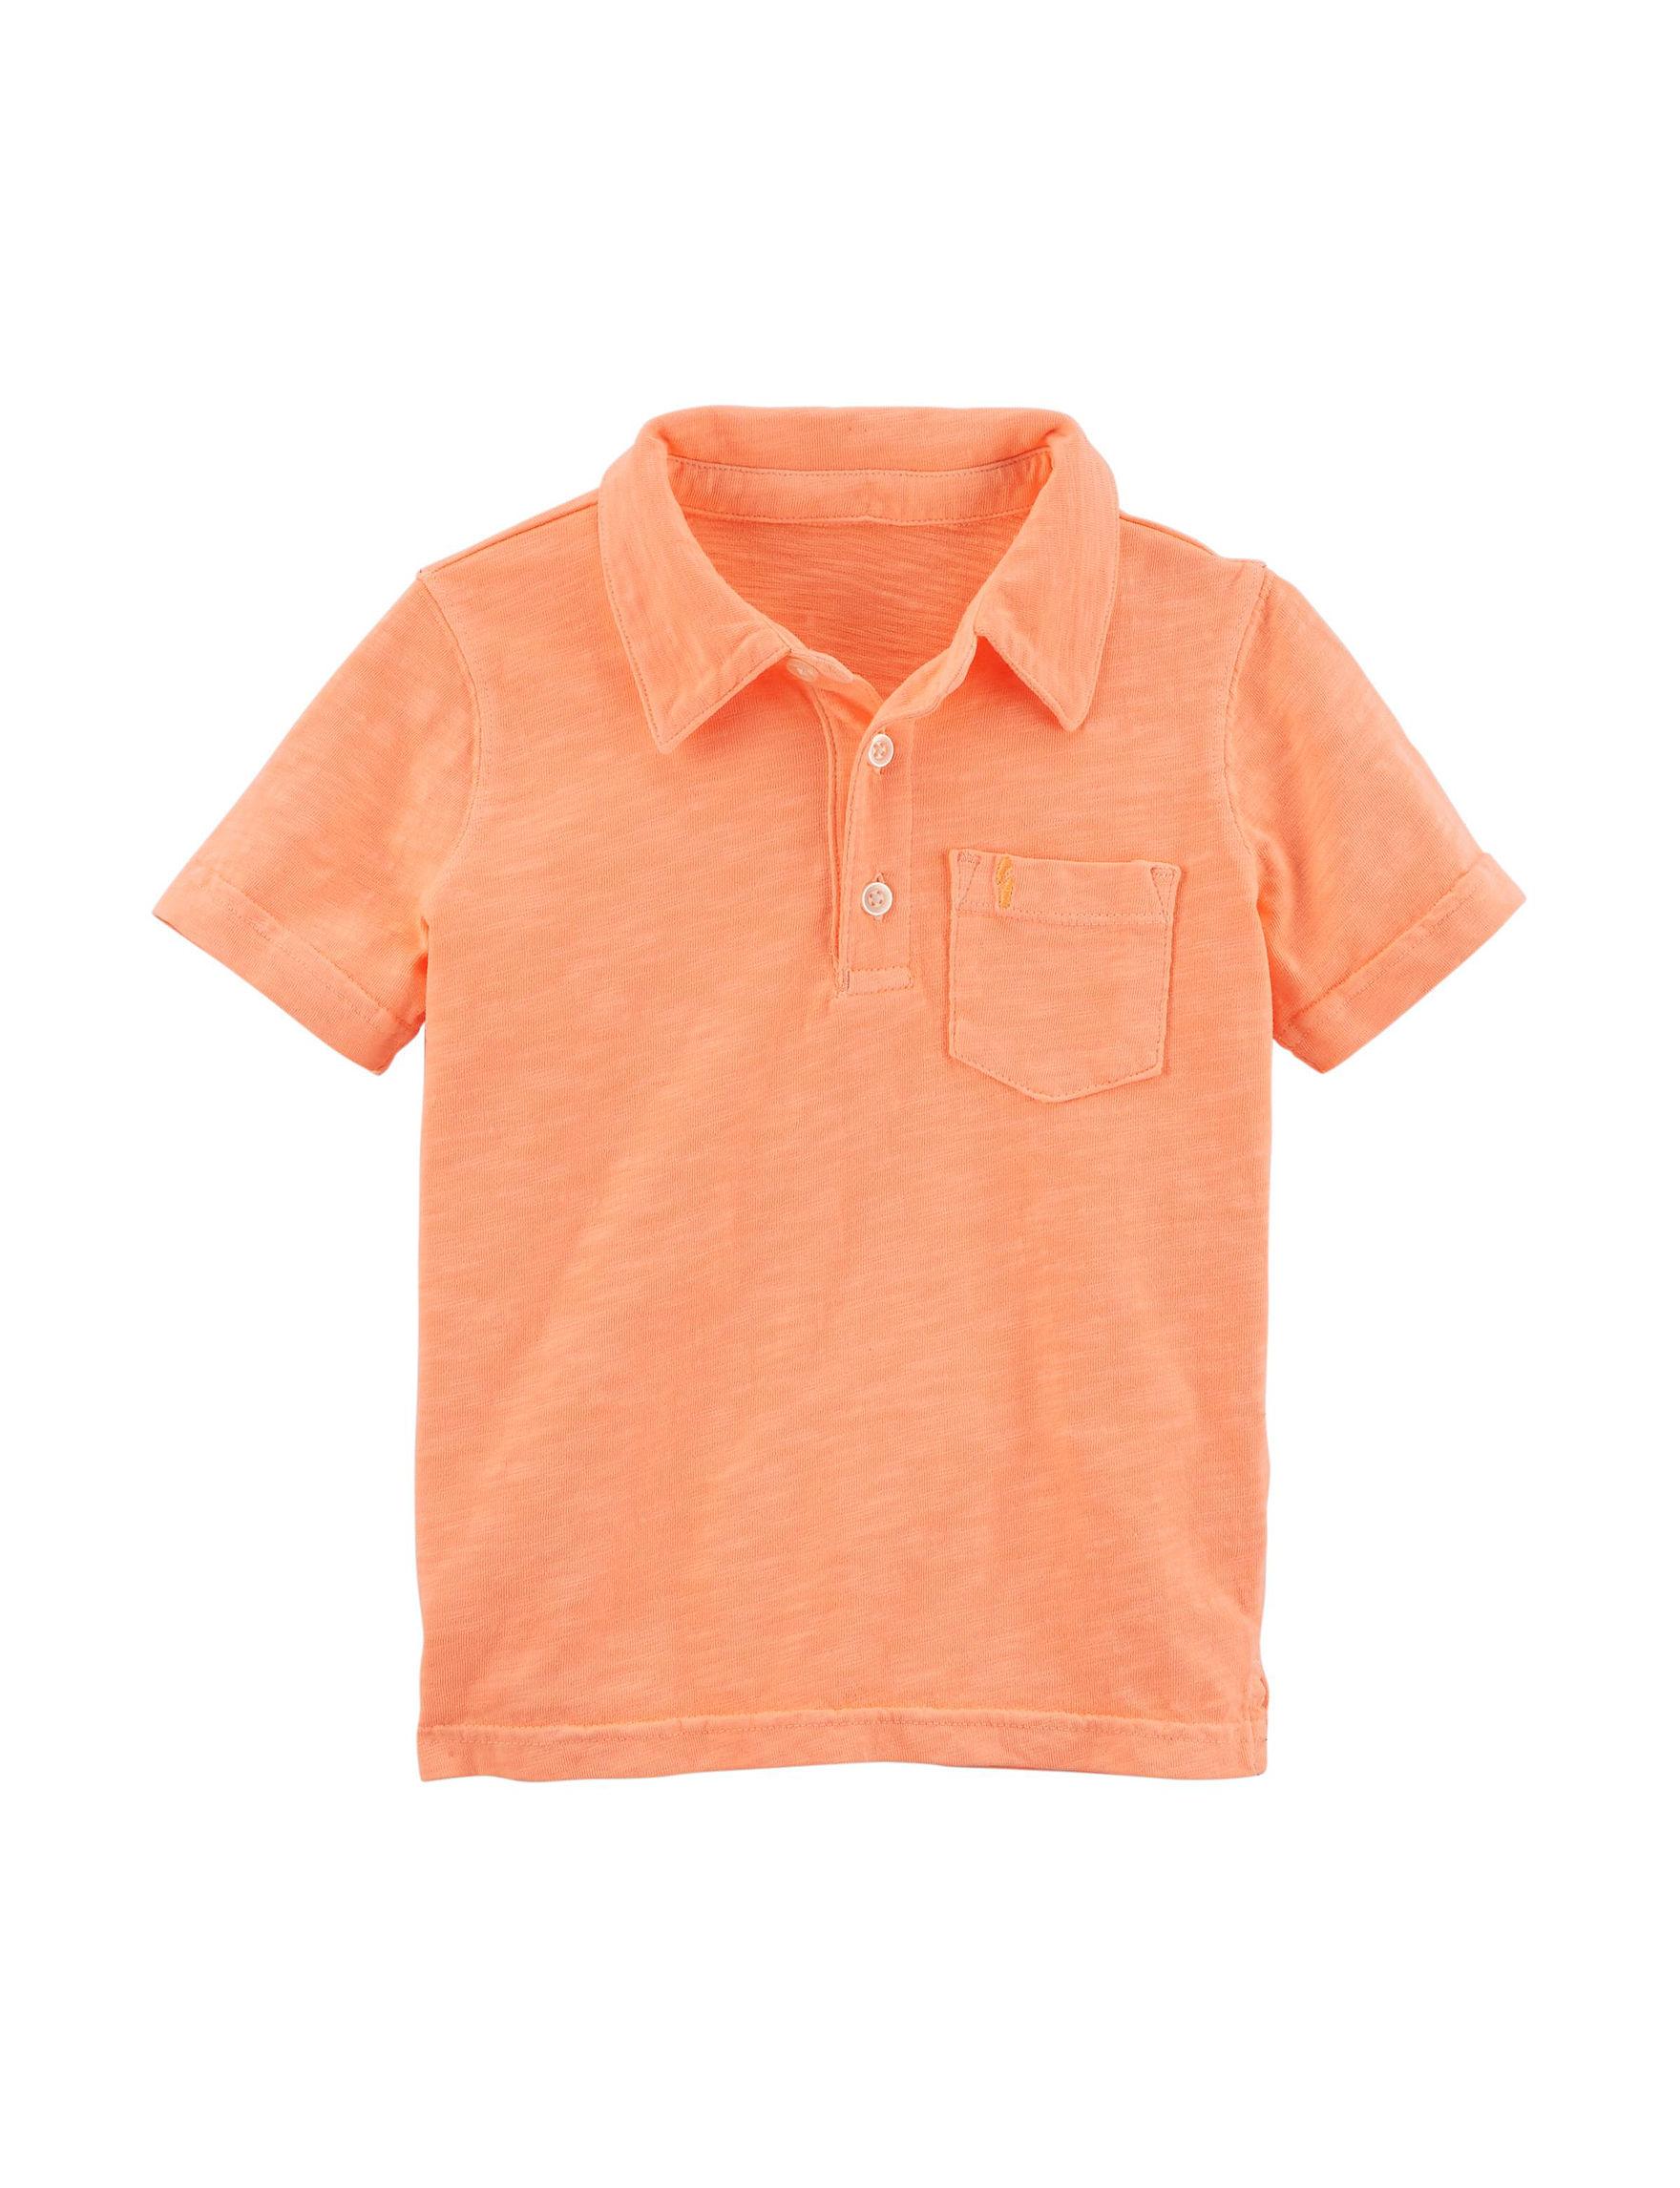 Carter's Orange